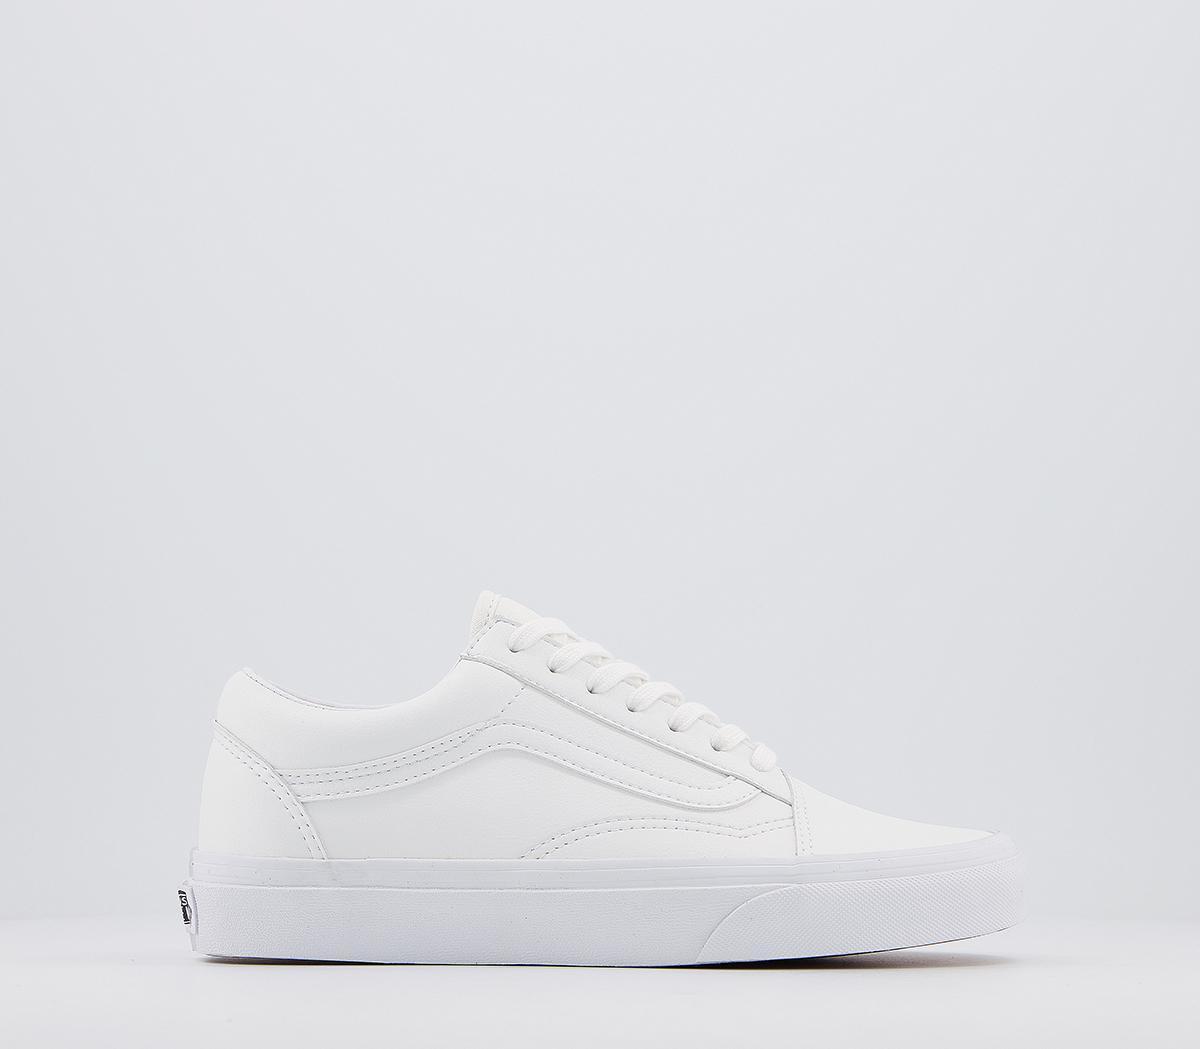 Vans Old Skool Trainers White White